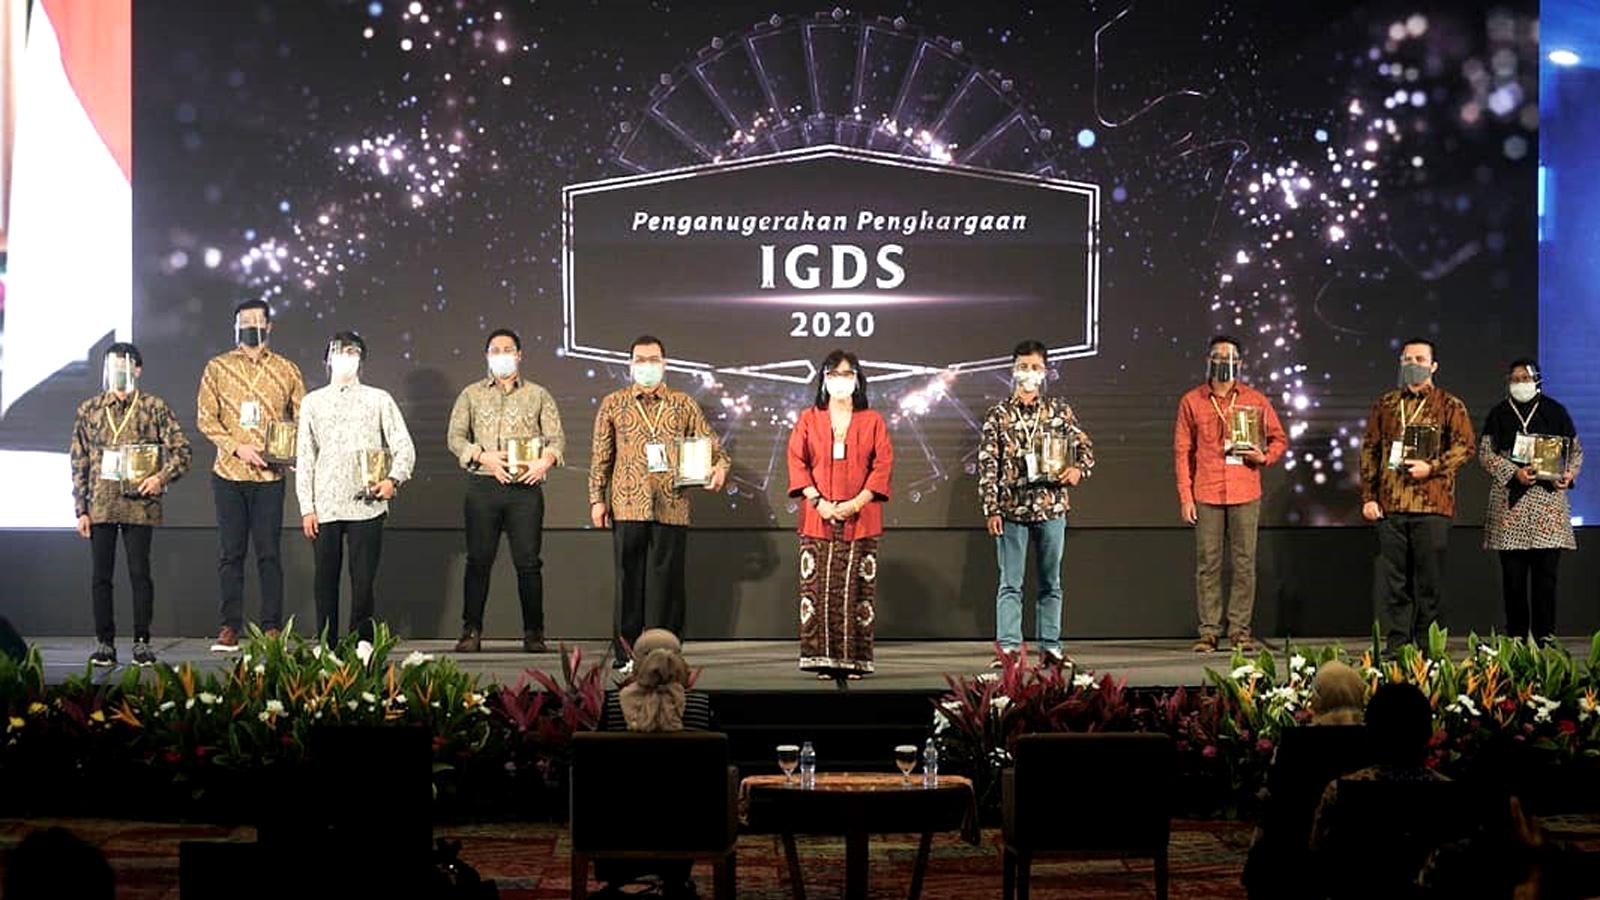 Promithevo Menerima Penghargaan Grand Award Design Concept IGDS 2020